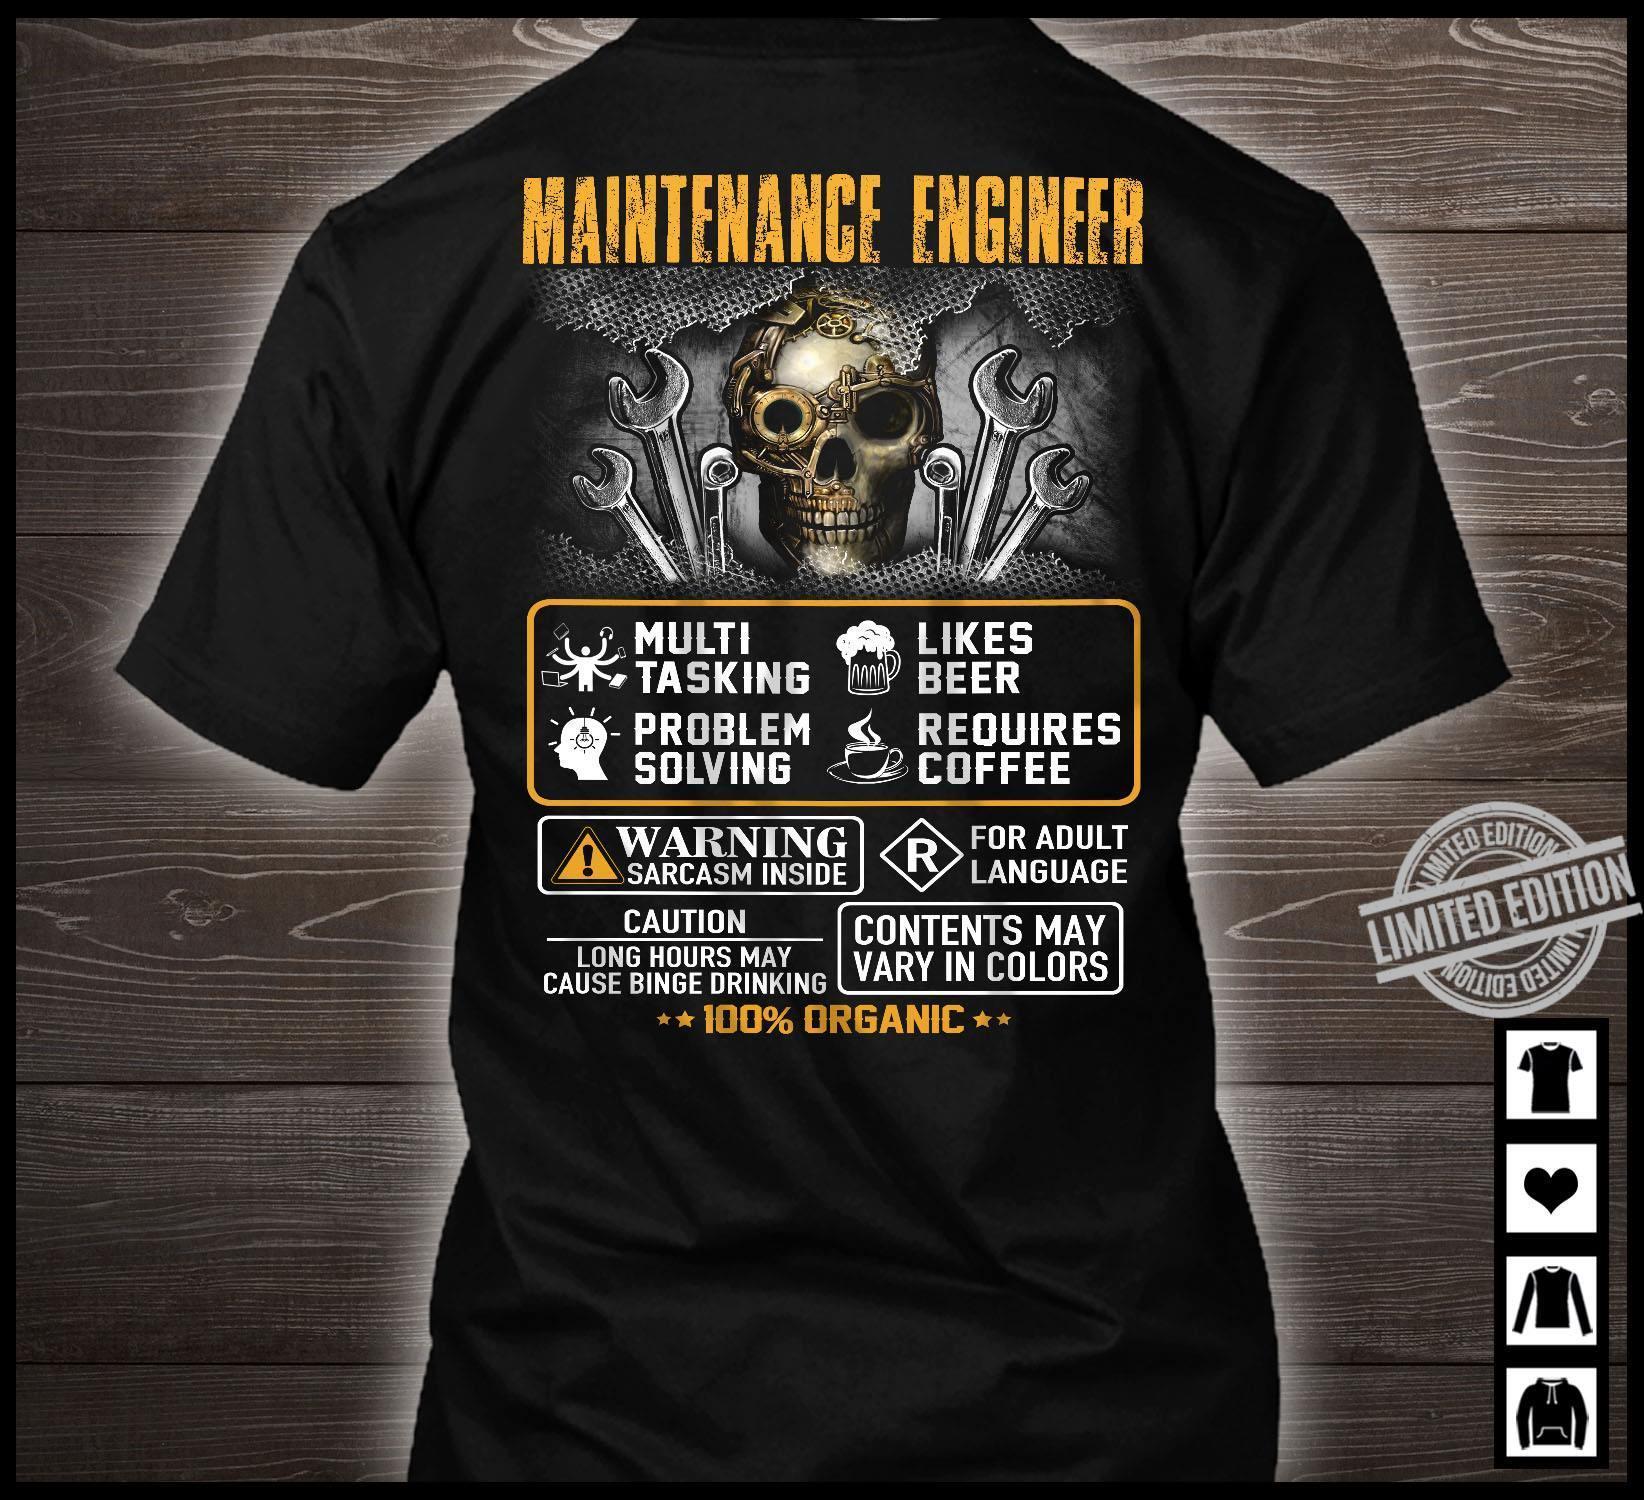 Maintenance Engineer Multi Tasking Problem Solving Likes Beer Reouires Coffee Warning Sarcasm Inside Shirt